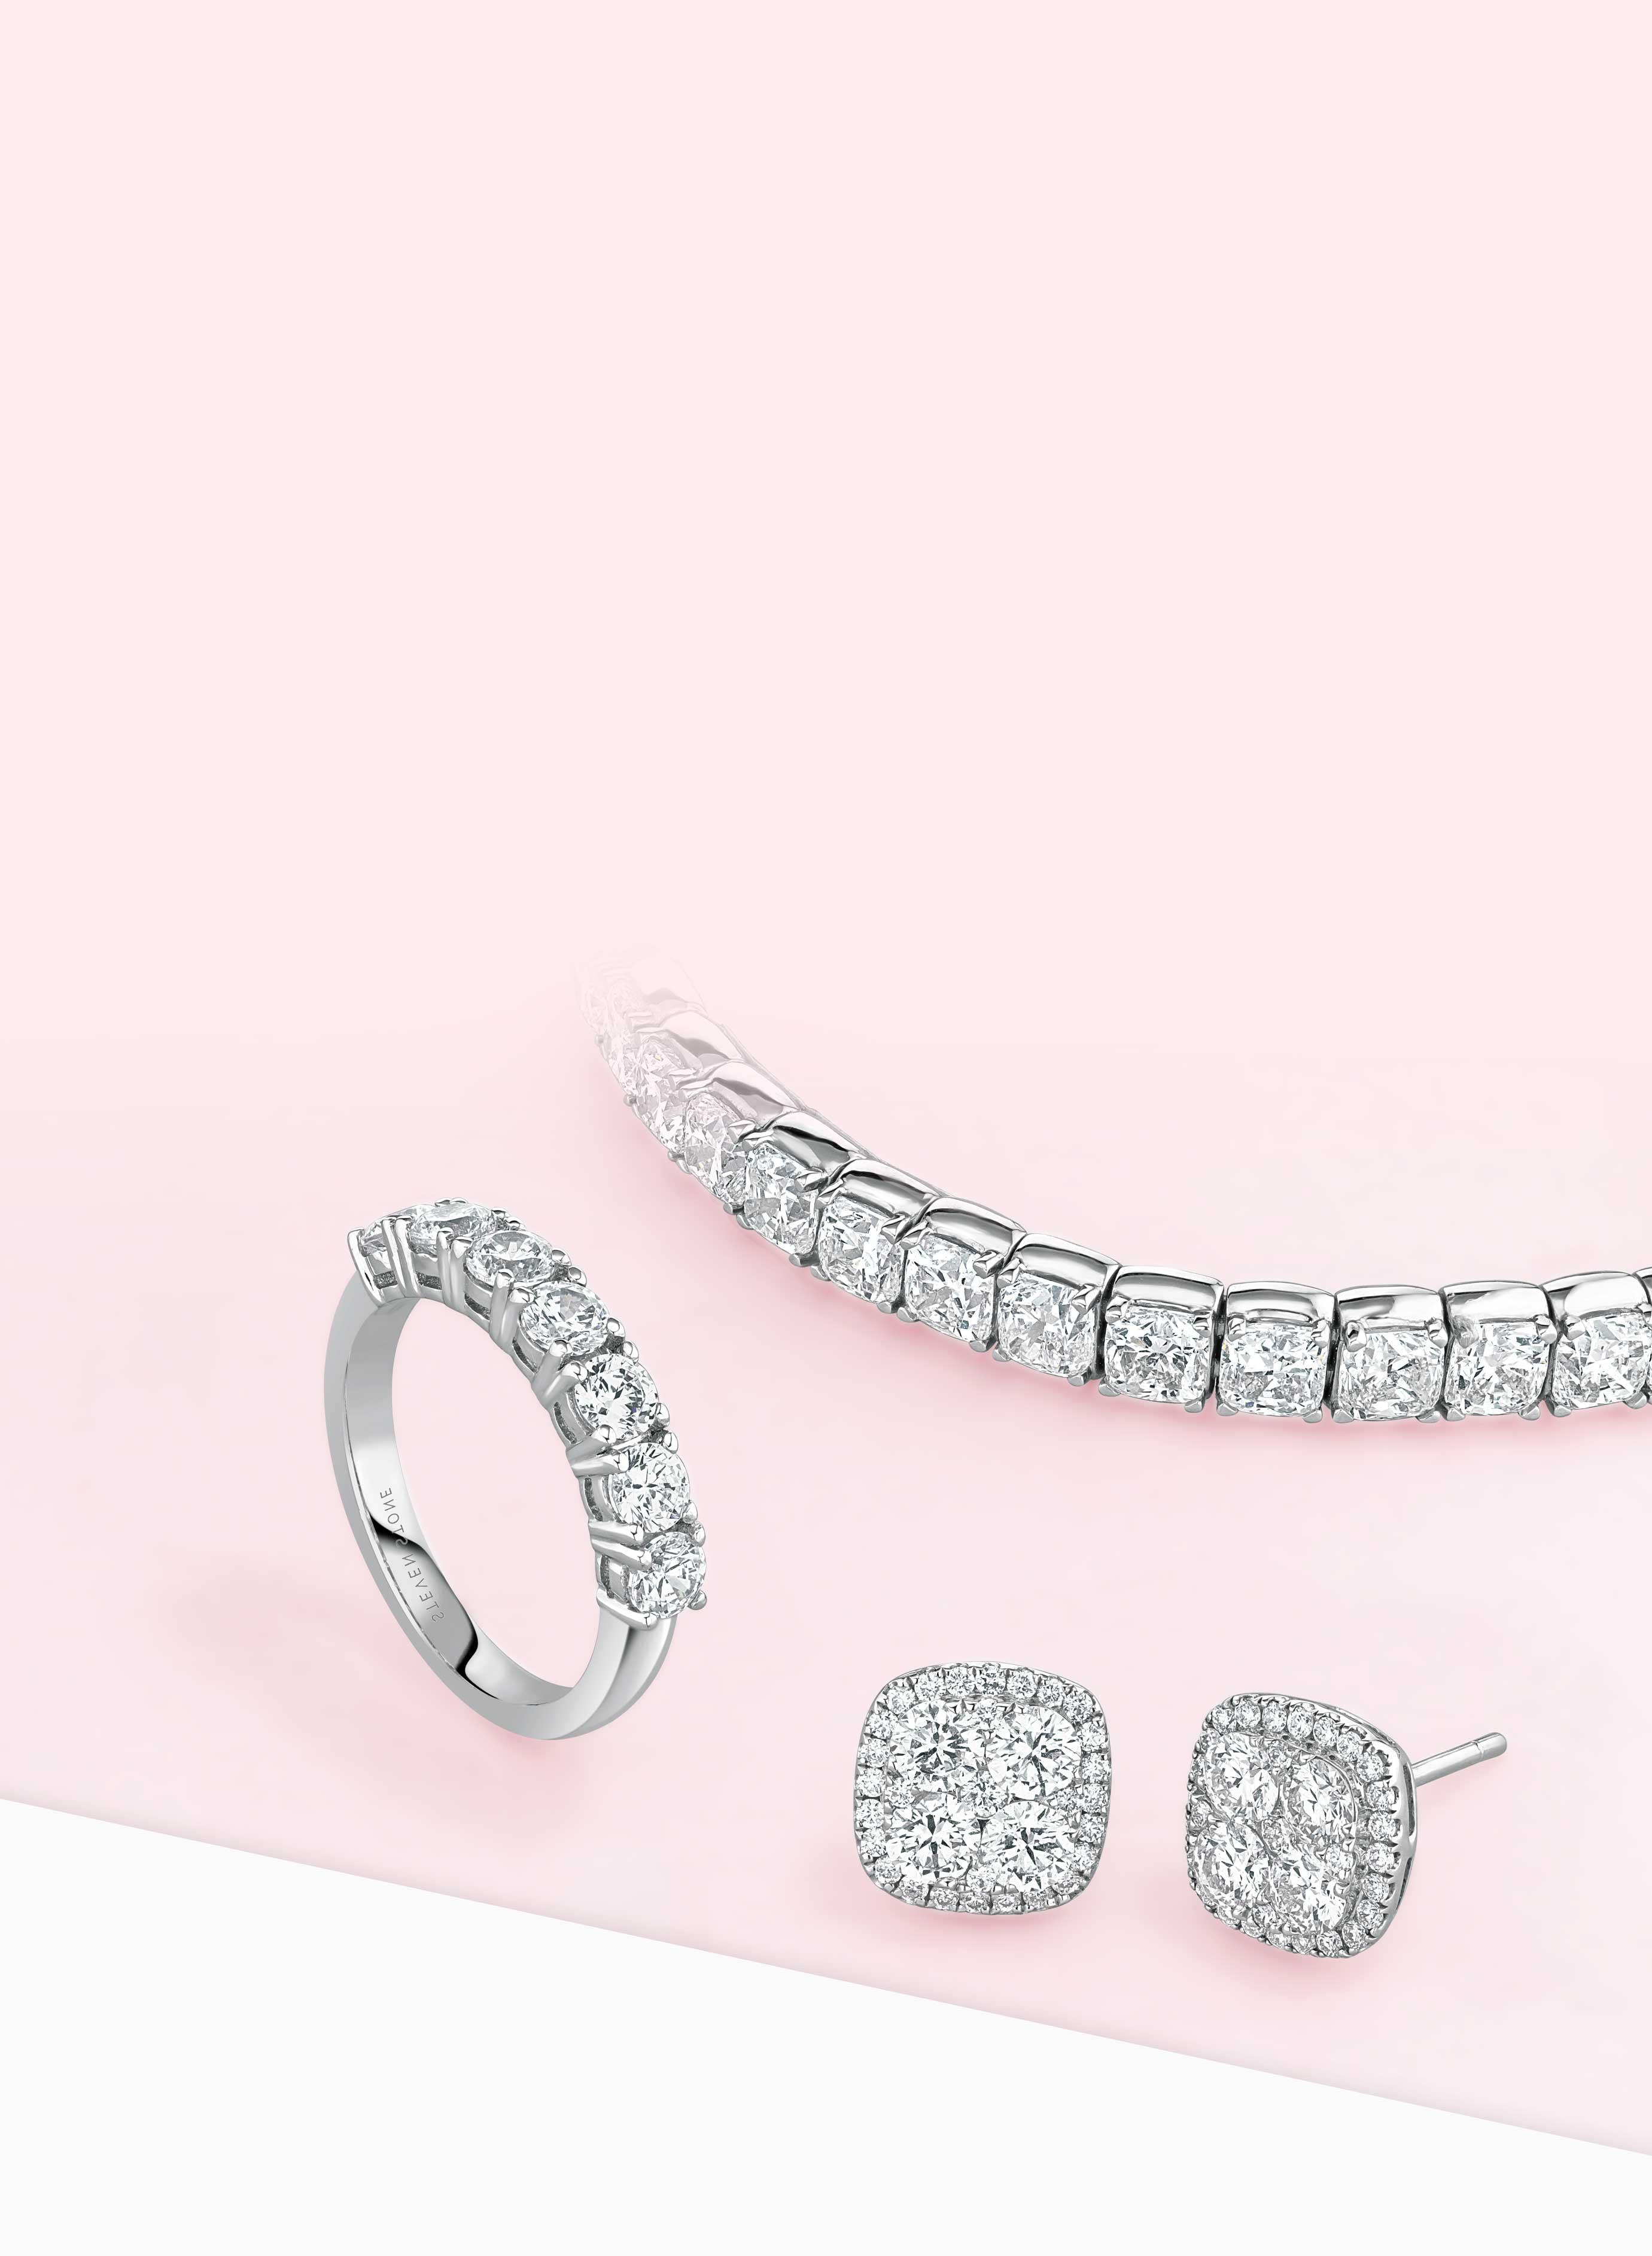 Jewellery & Gifts - Steven Stone